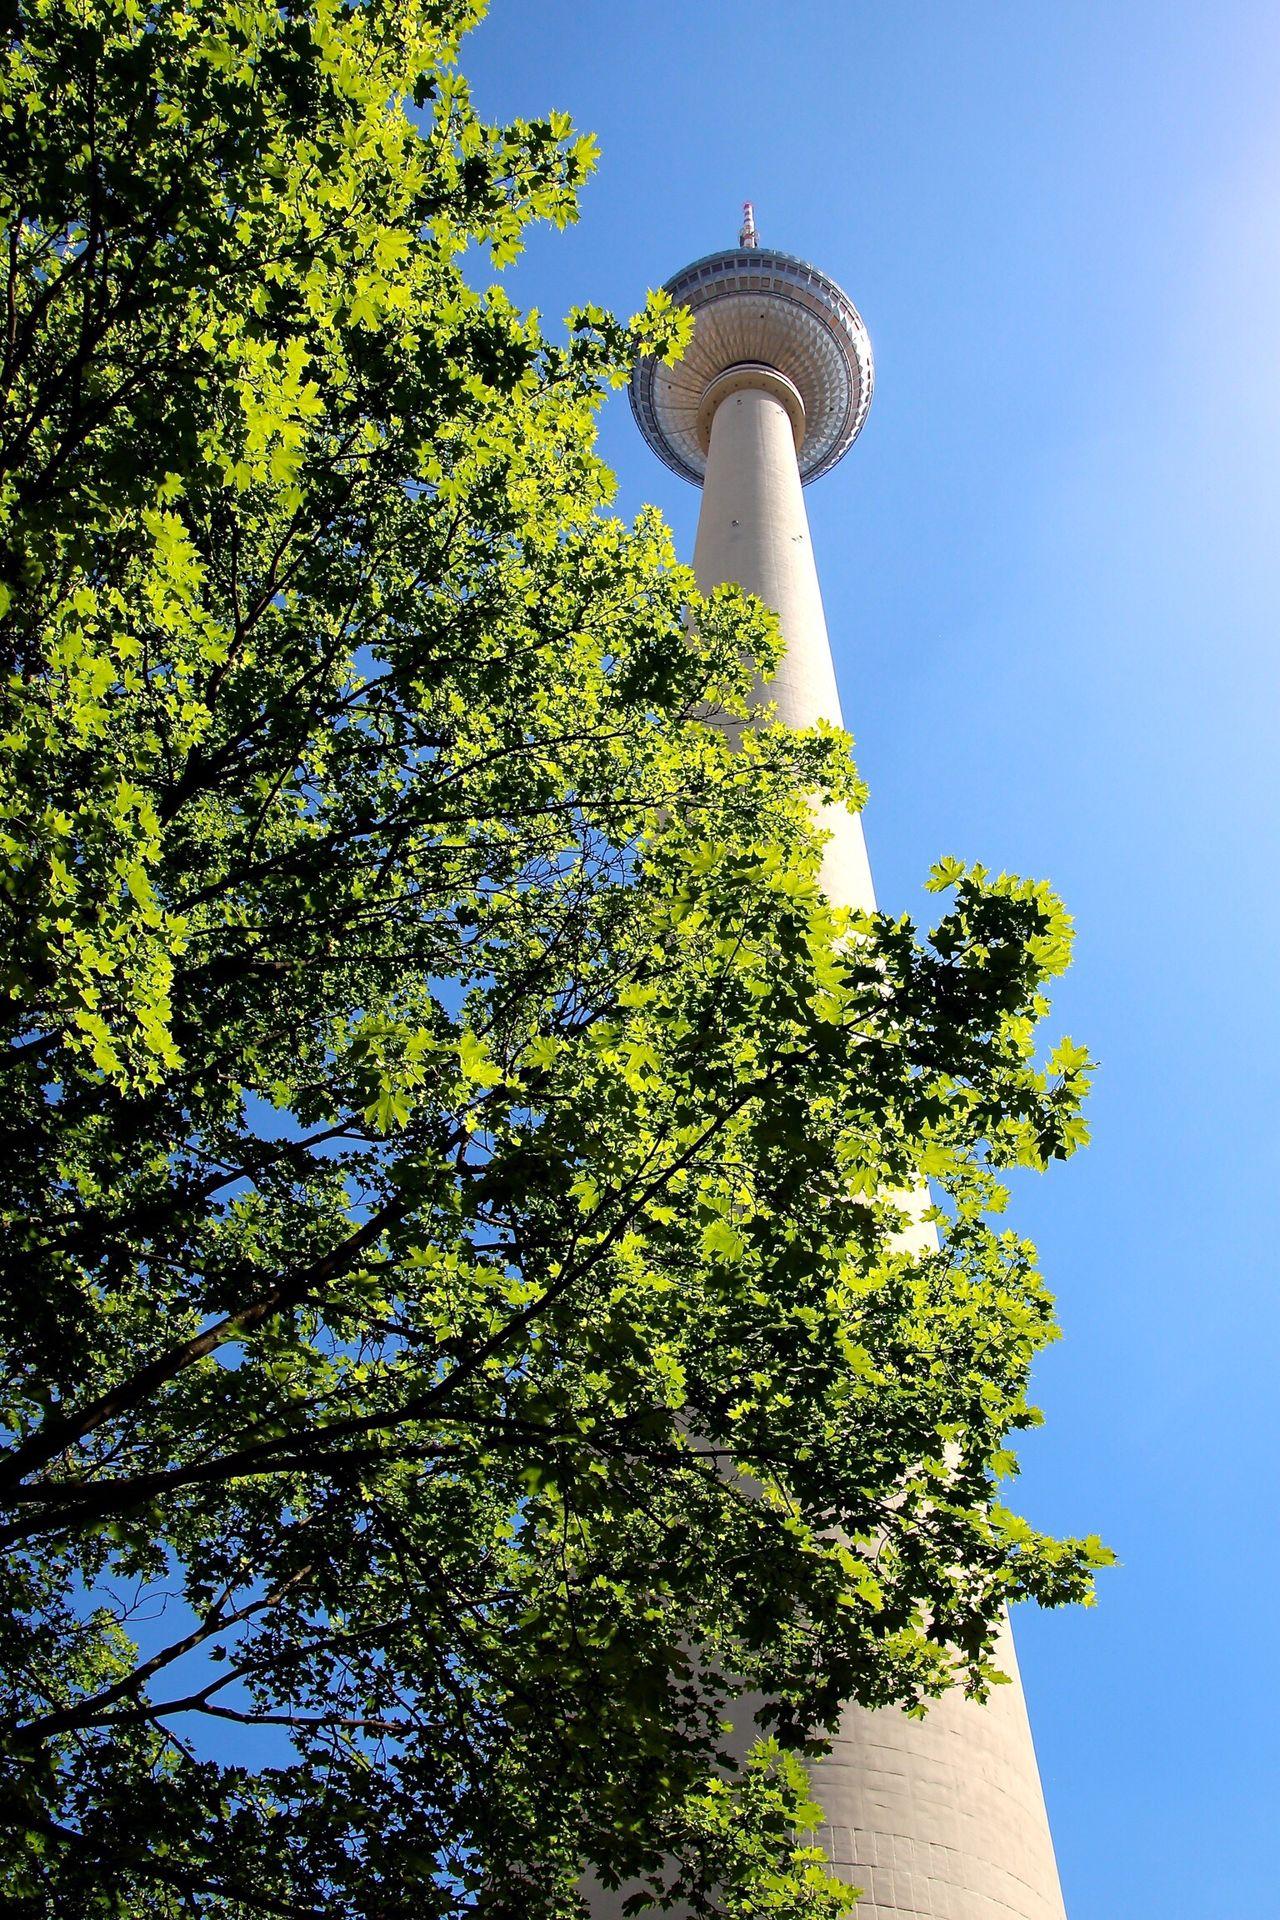 Berlin Berliner Ansichten TV Tower Sky Tree Tower Eye4photography  OpenEdit Tadaa Community AMPt_community EyeEm Best Edits Open Edit EyeEm Best Shots